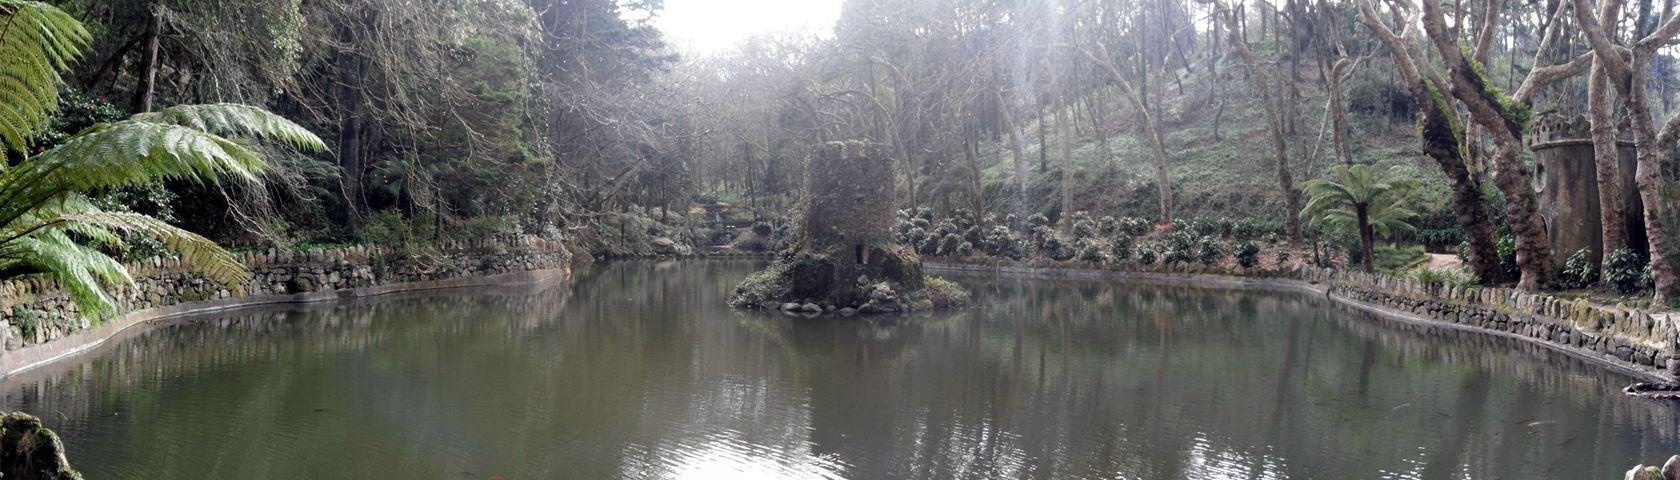 Parque Pena - Sintra, Portugal